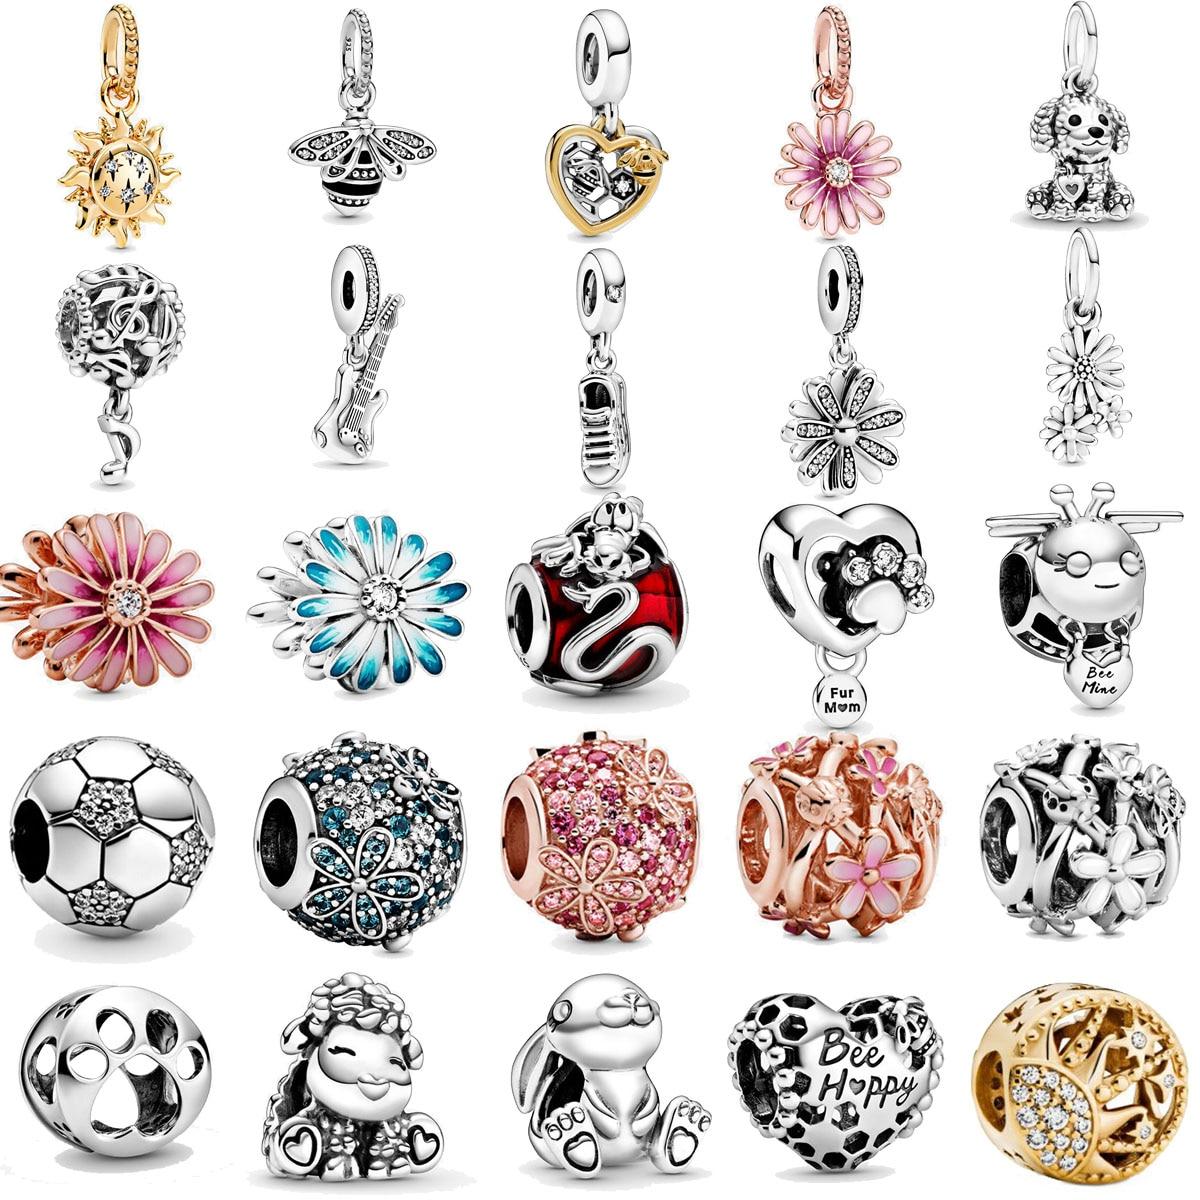 2020 Spring New 925 Sterling Silver Beads Sparkling Daisy Flower Dog Charms Fit Original Pandora Bracelets Women DIY Jewelry